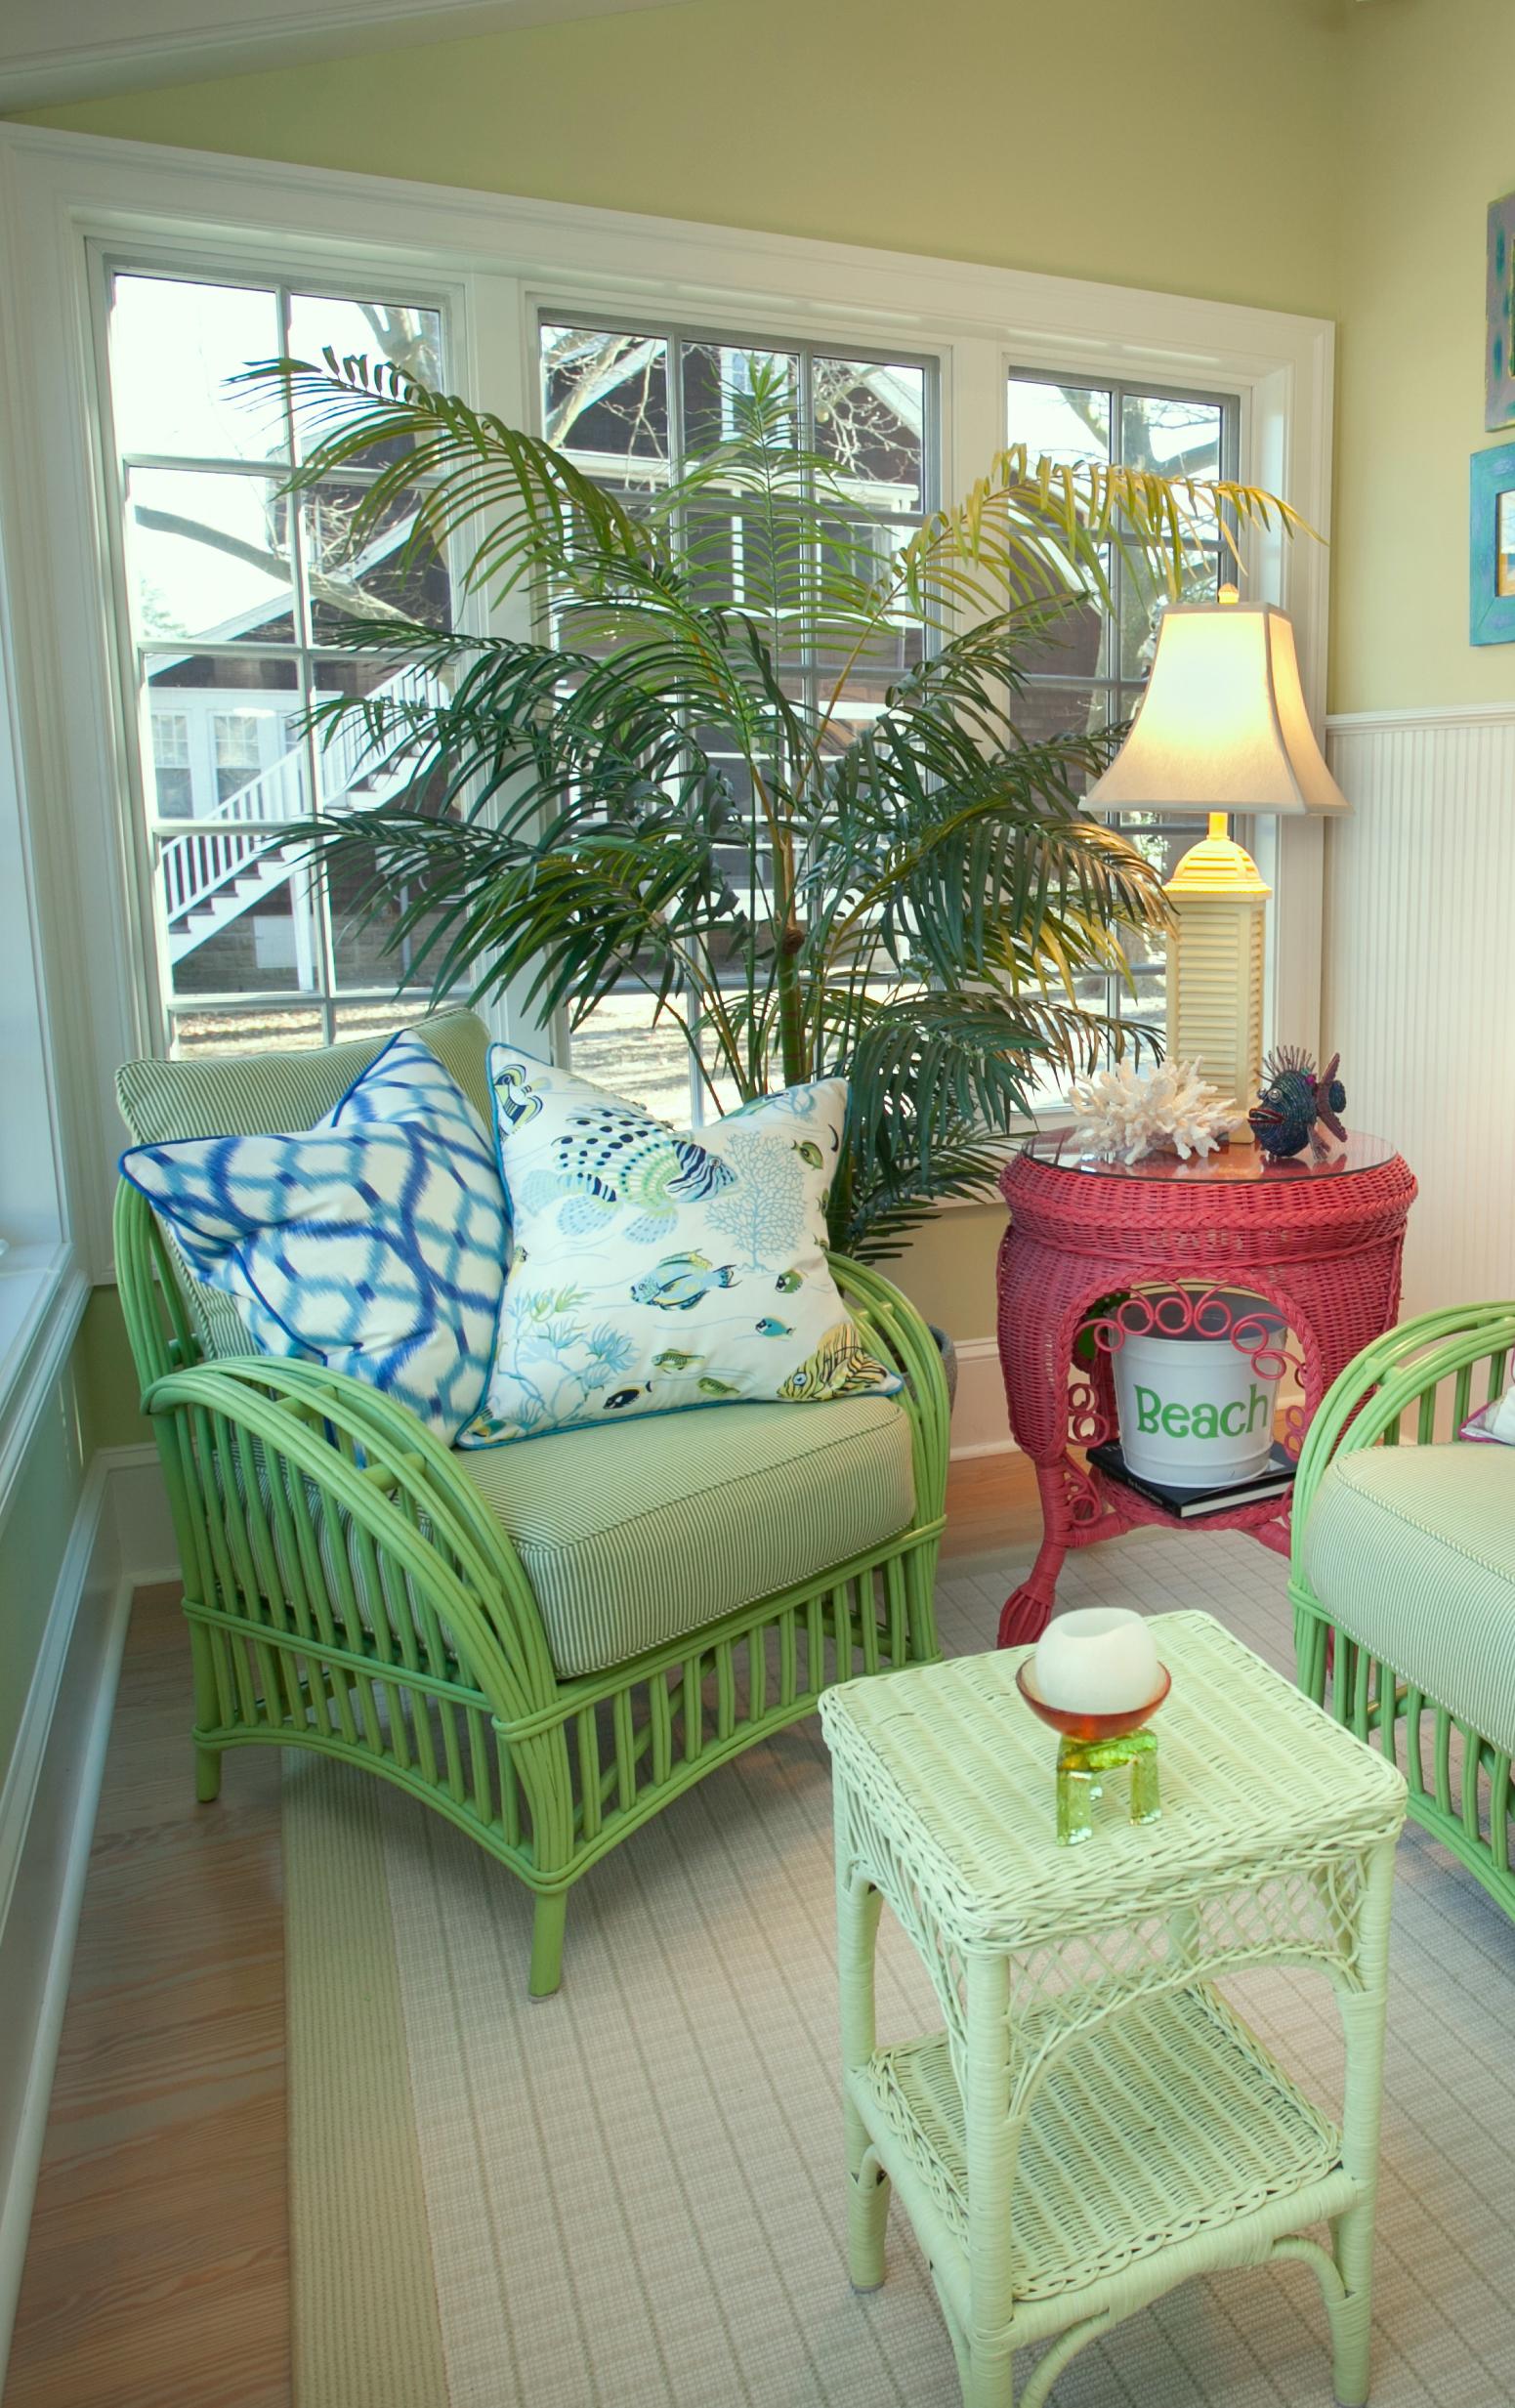 100 Vibrant Creative Coastal Home Decor 4135 Best Coastal Decorating Images On Pinterest Beach